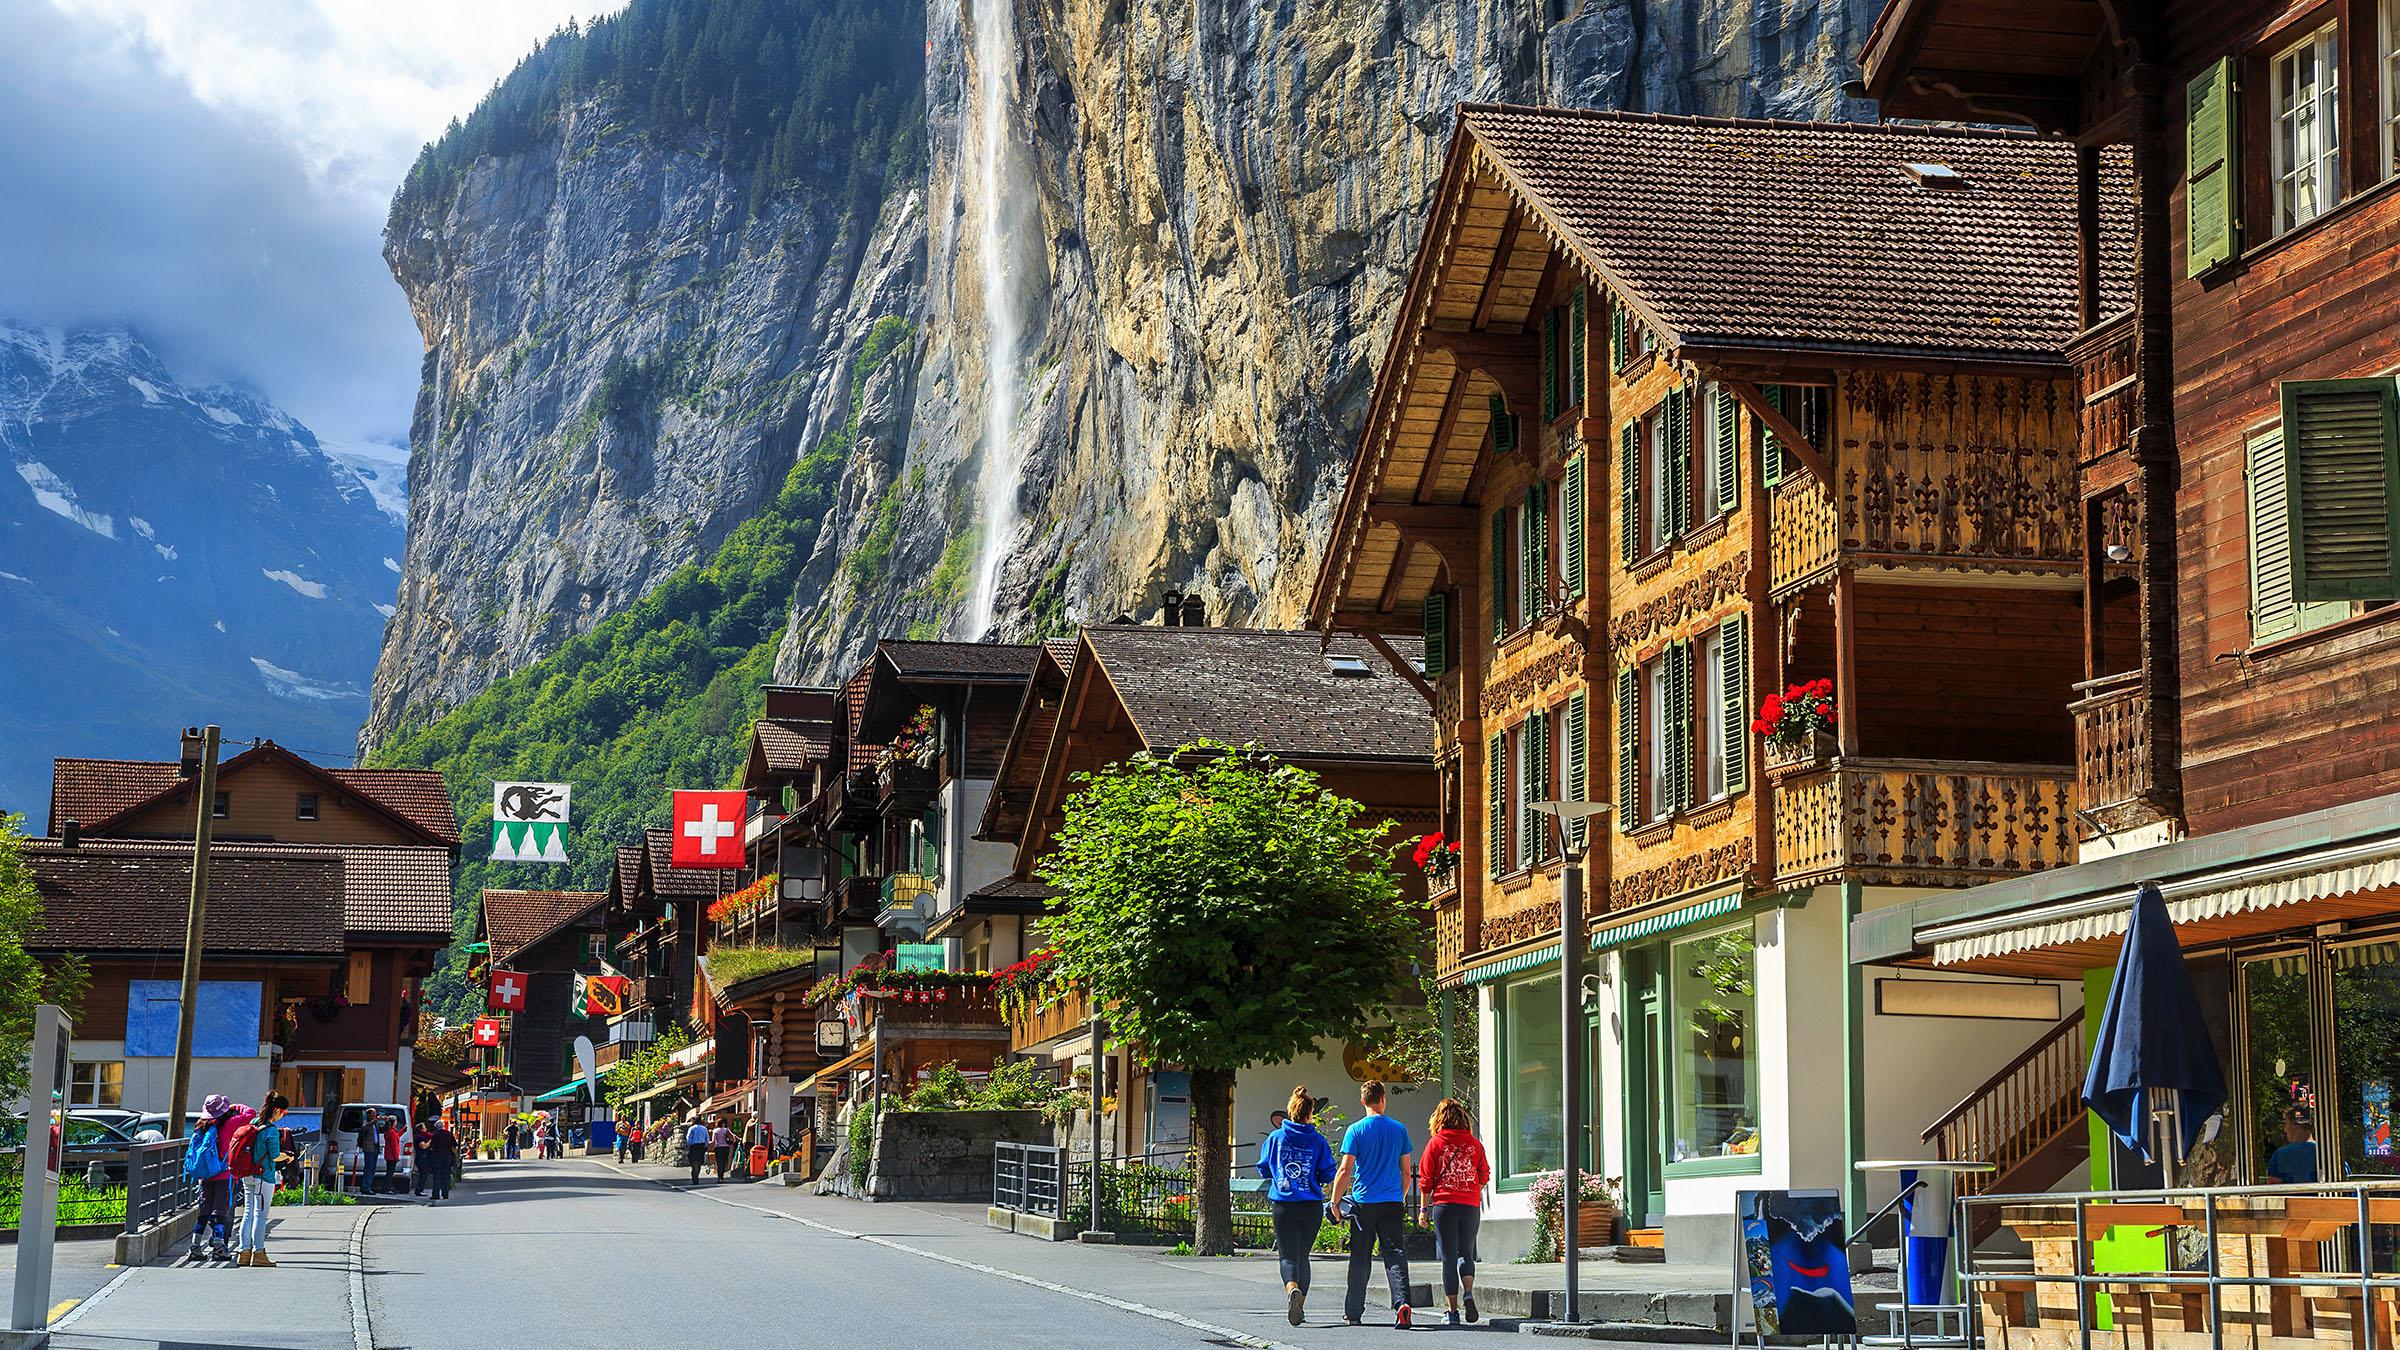 lauterbrunnen-una-zona-unica-de-suiza